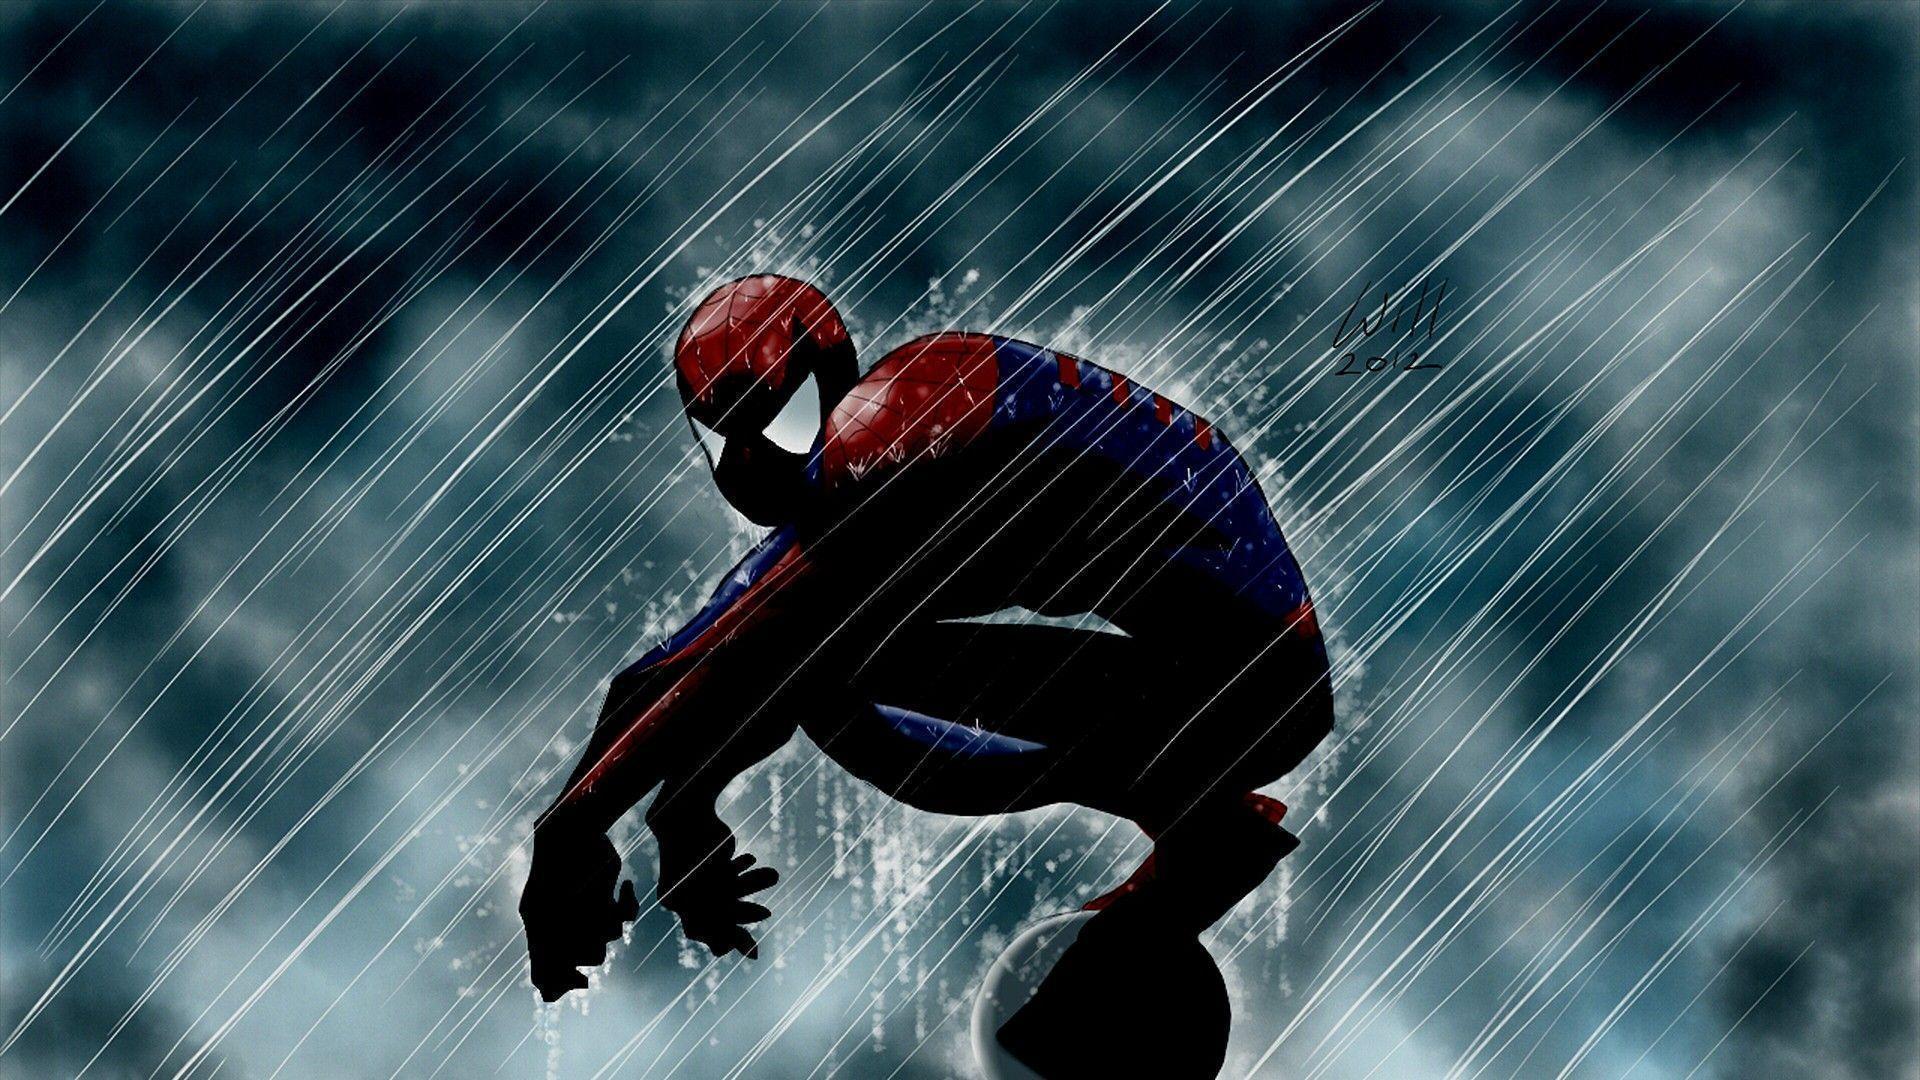 Spiderman 2015 Wallpapers - Wallpaper Cave